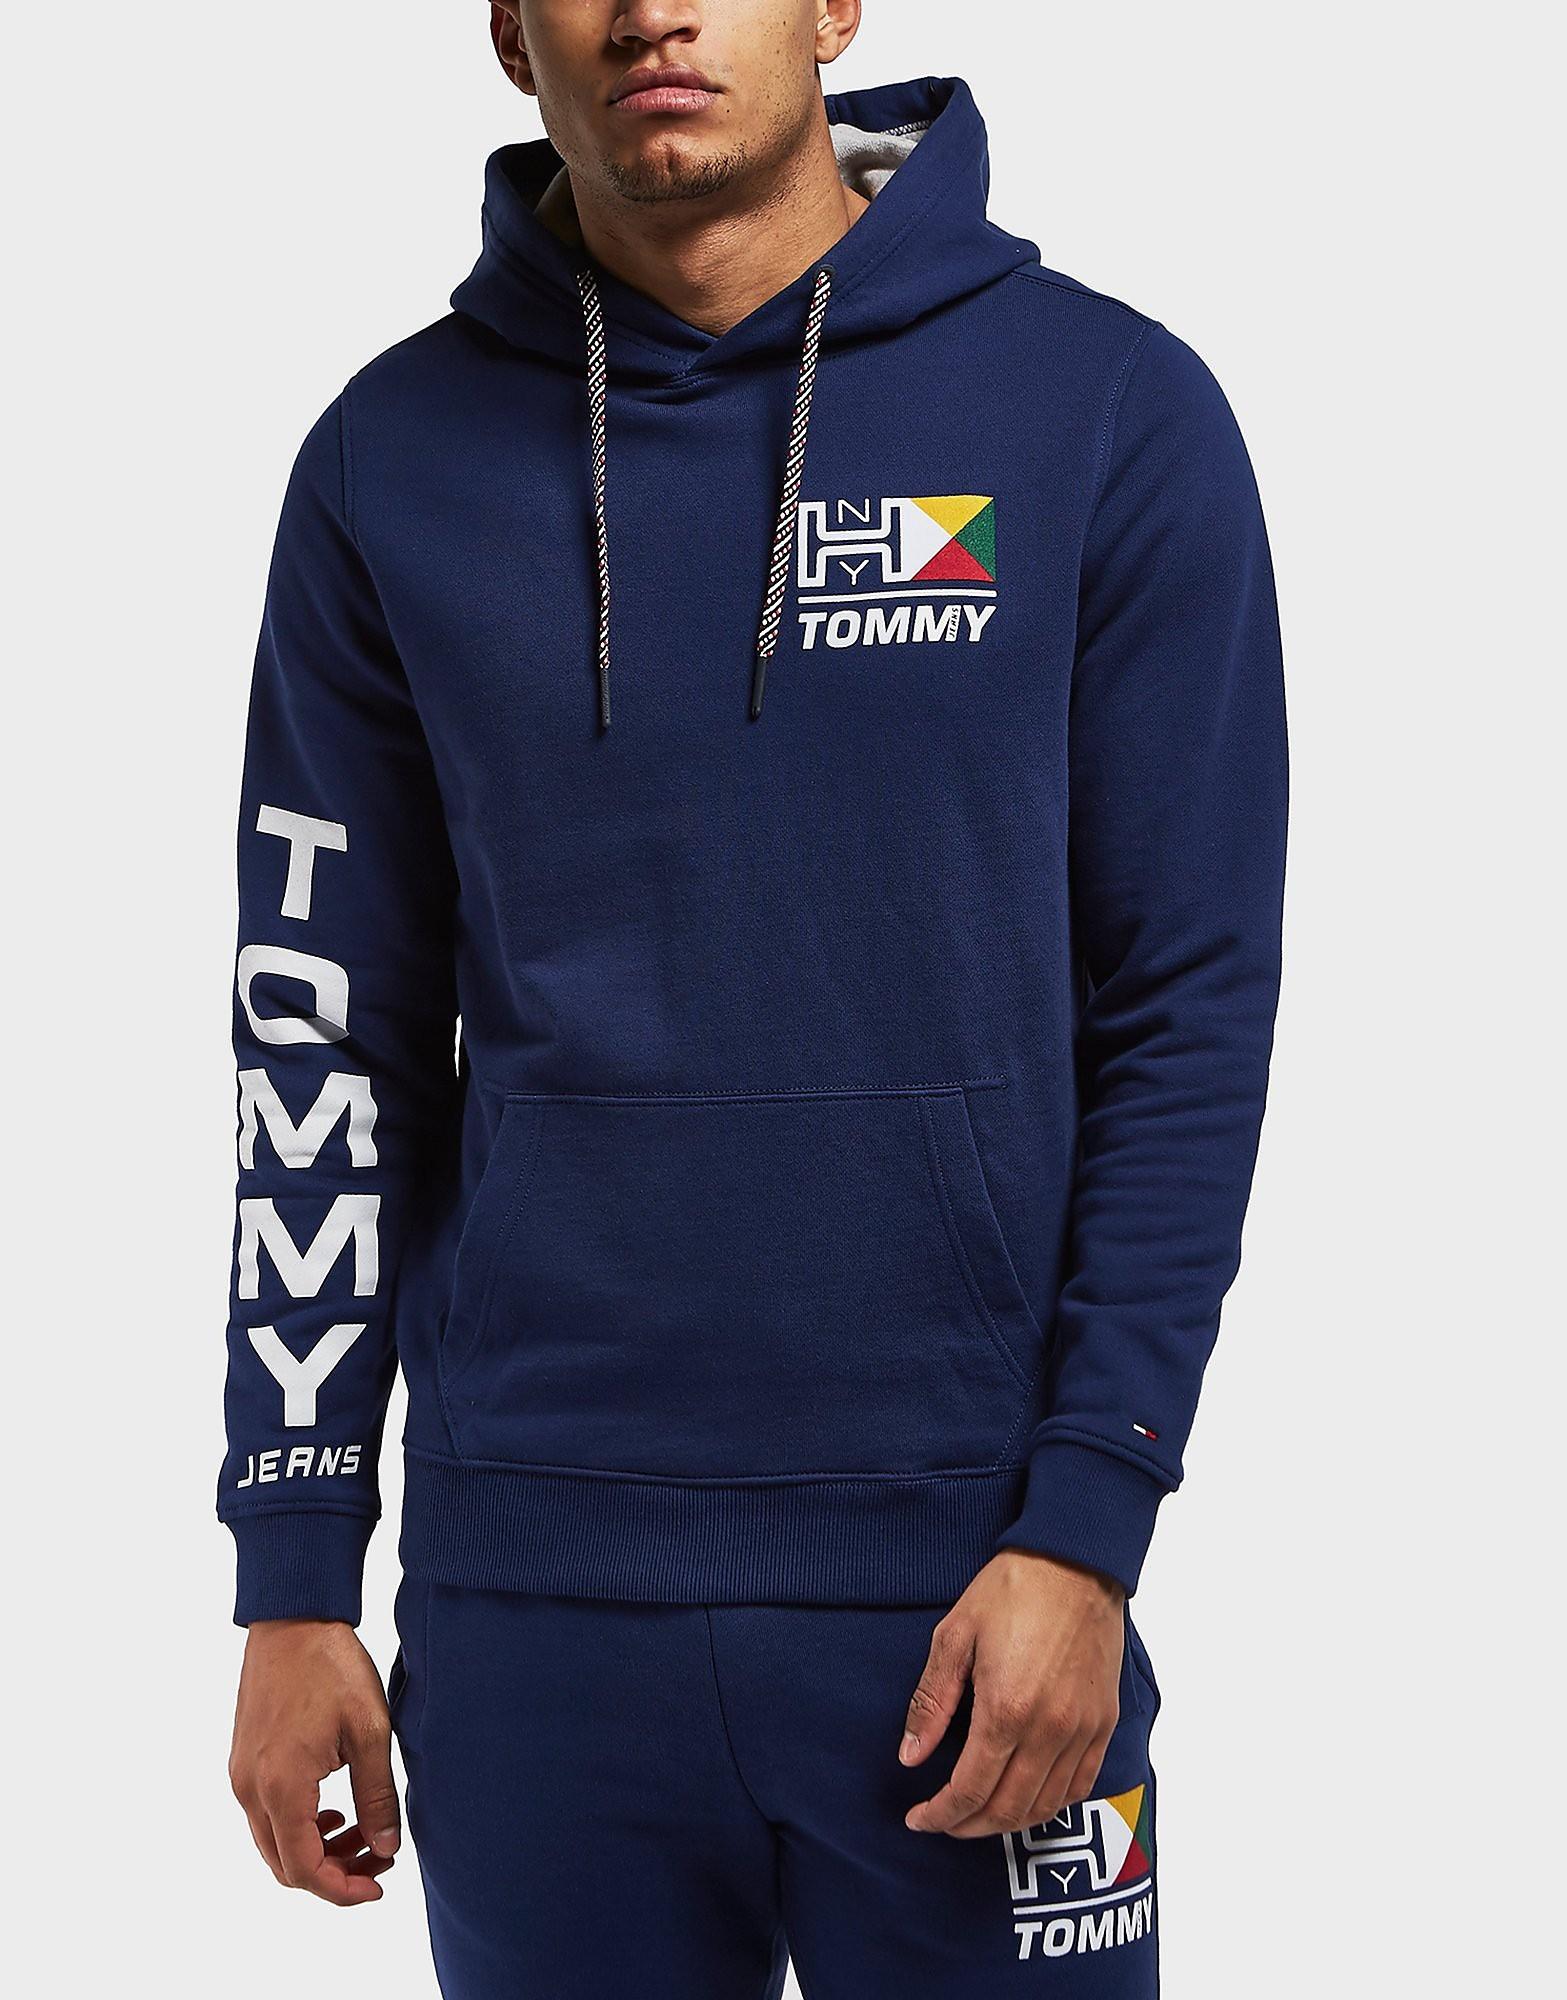 Tommy Hilfiger Retro Logo Overhead Hoodie